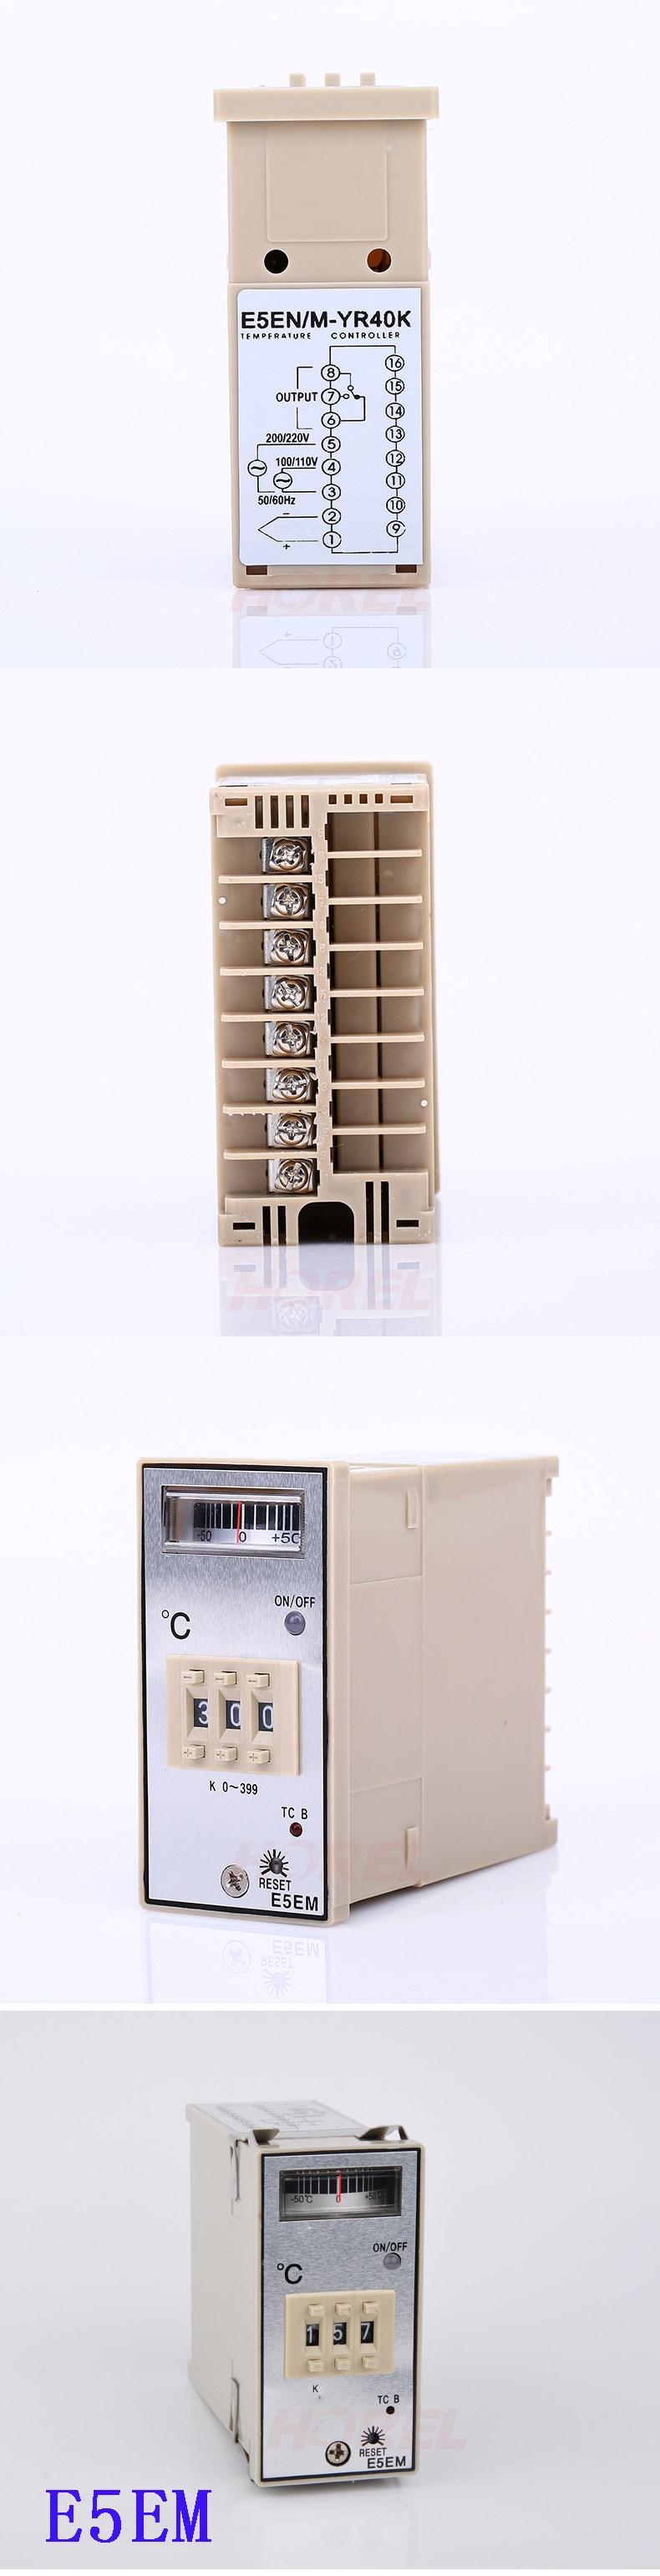 E5EM Temperature controller 3.jpg